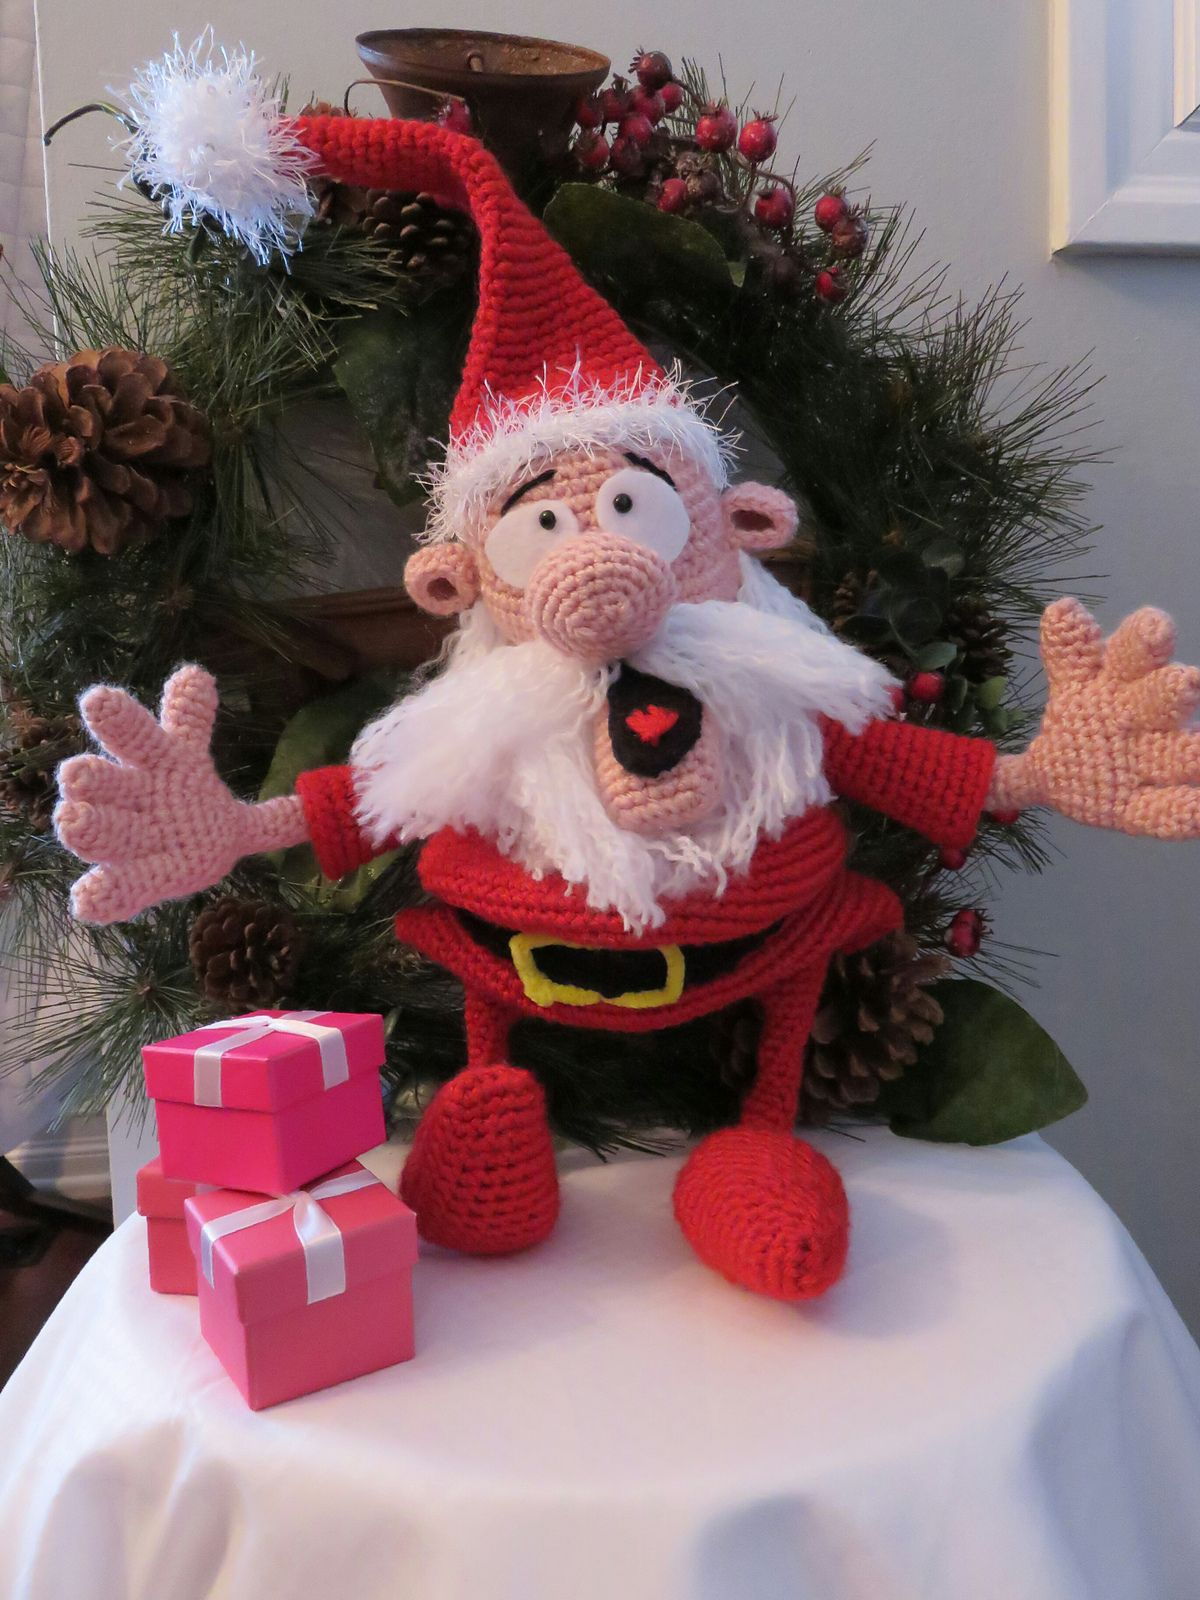 Ravelry: afrsss' Santa Claus Amigurumi